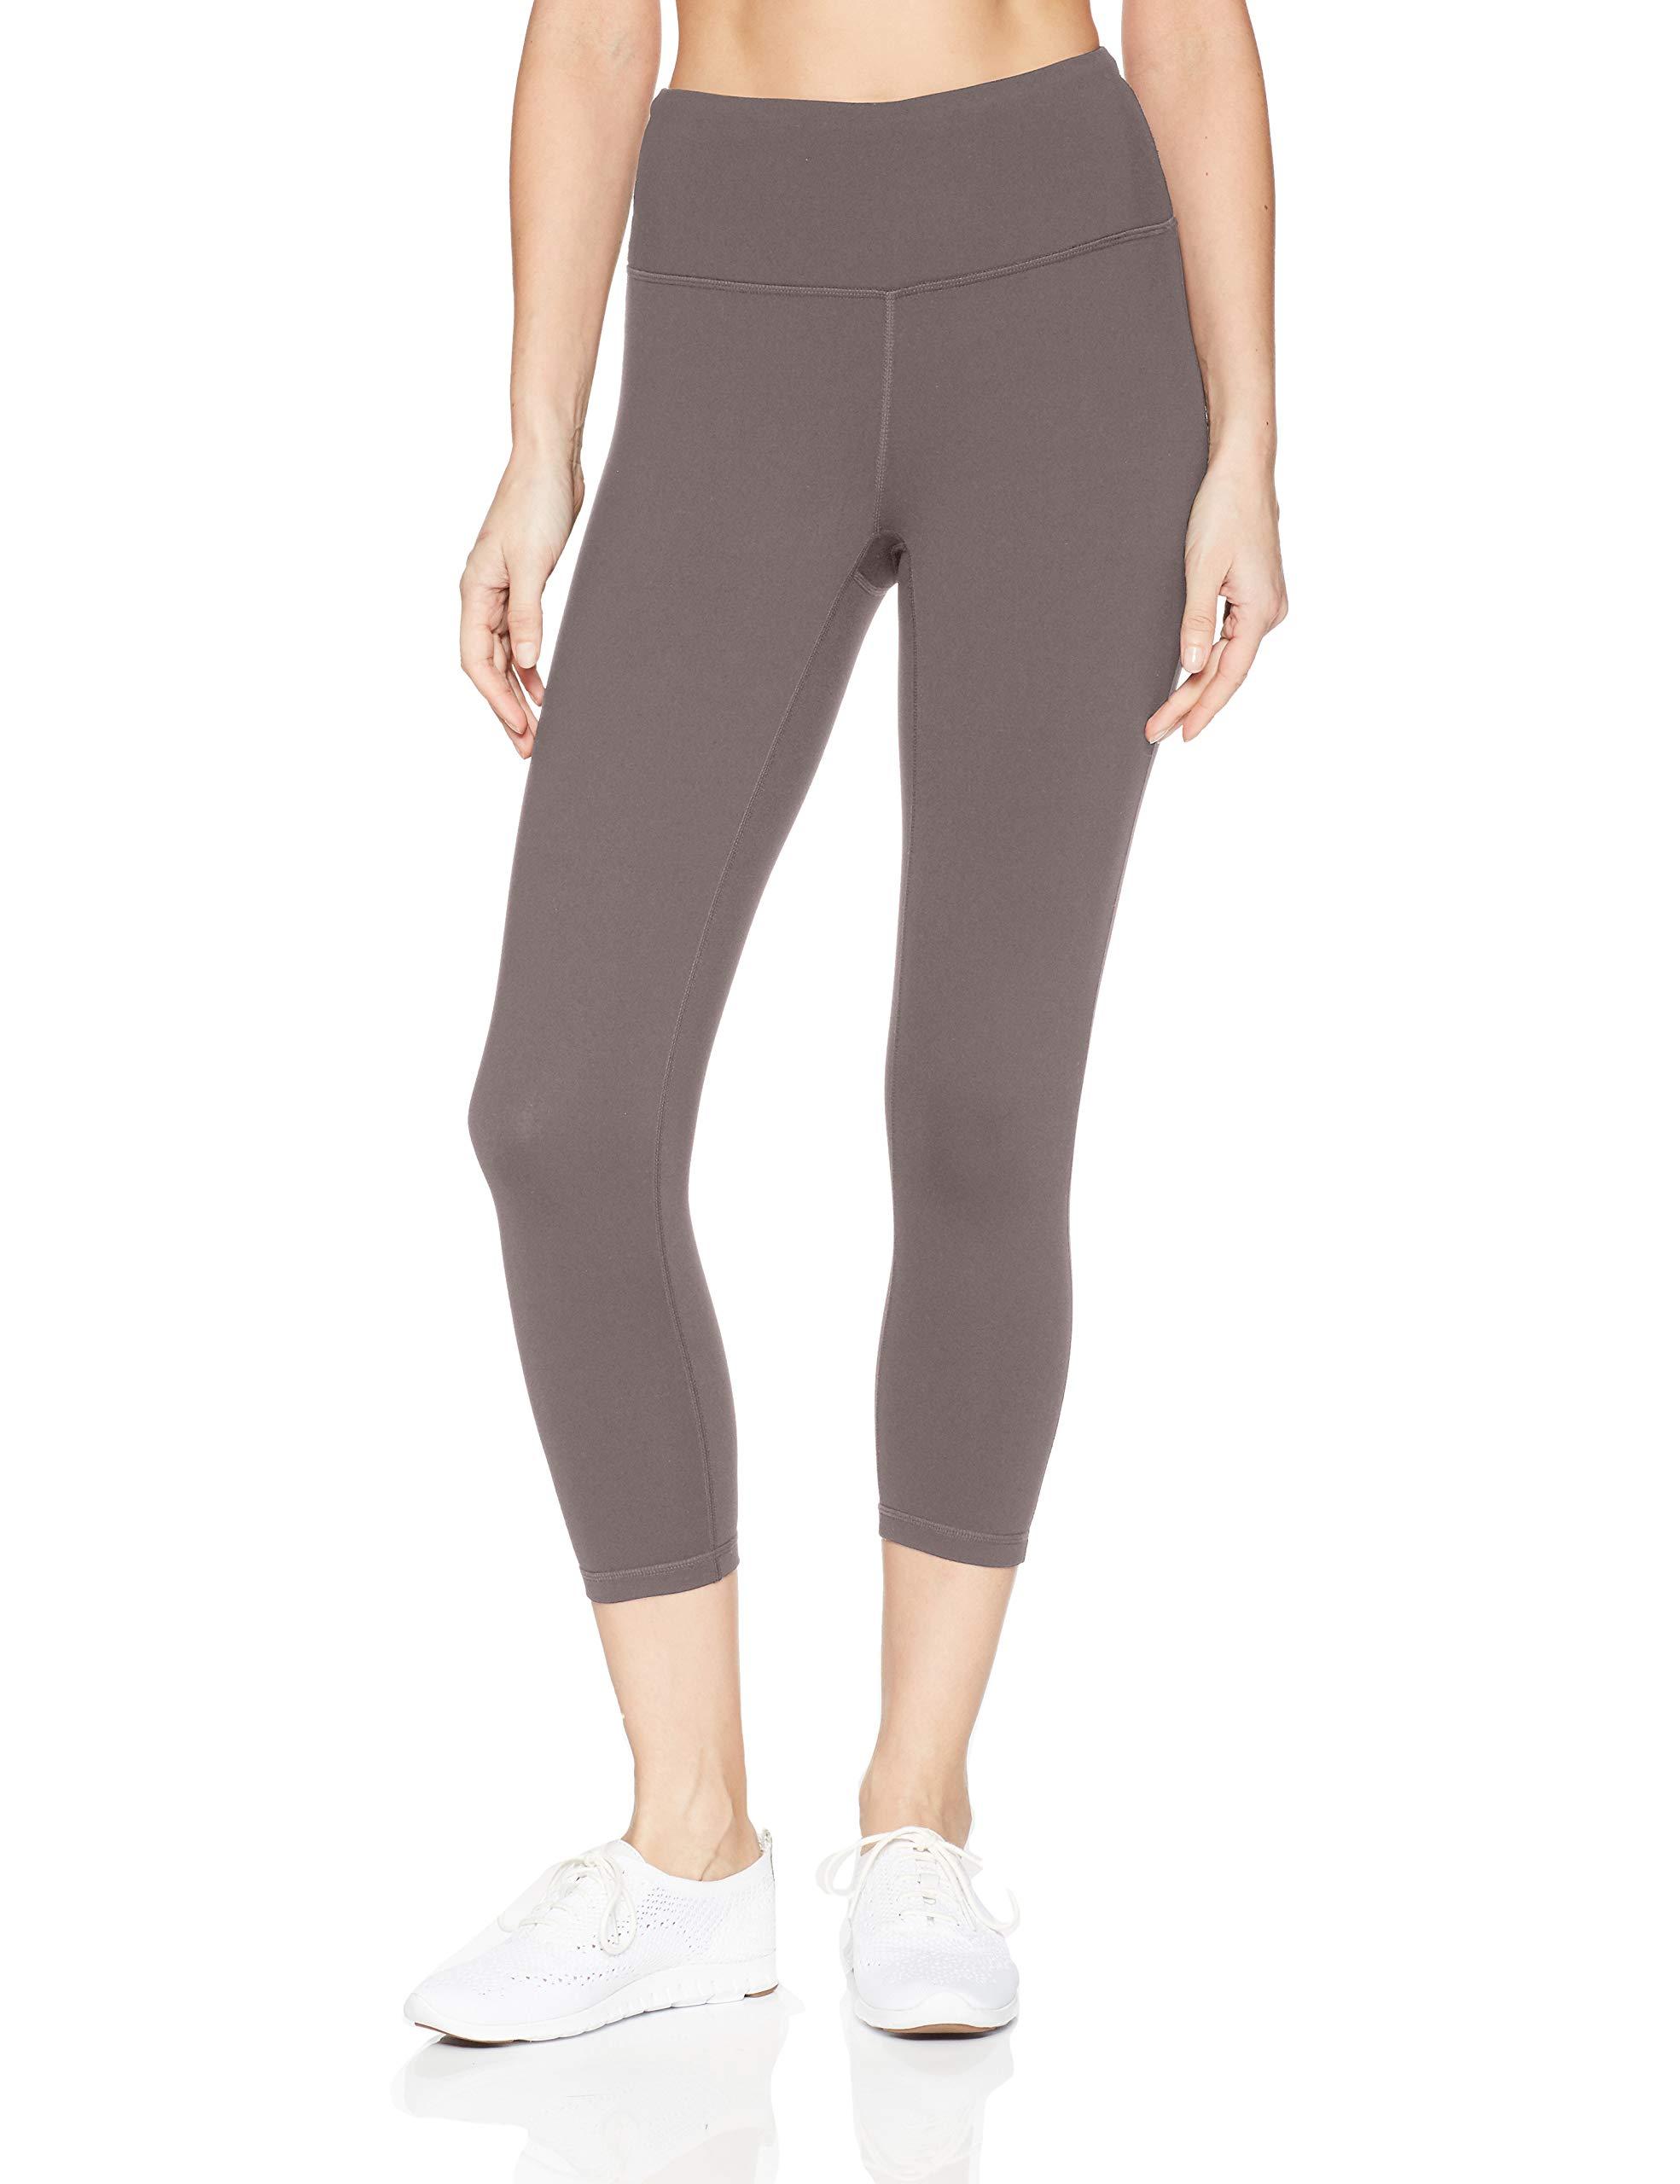 Helly Hansen Womens VTR Versatile Training Core 7//8 Capri Yoga pant